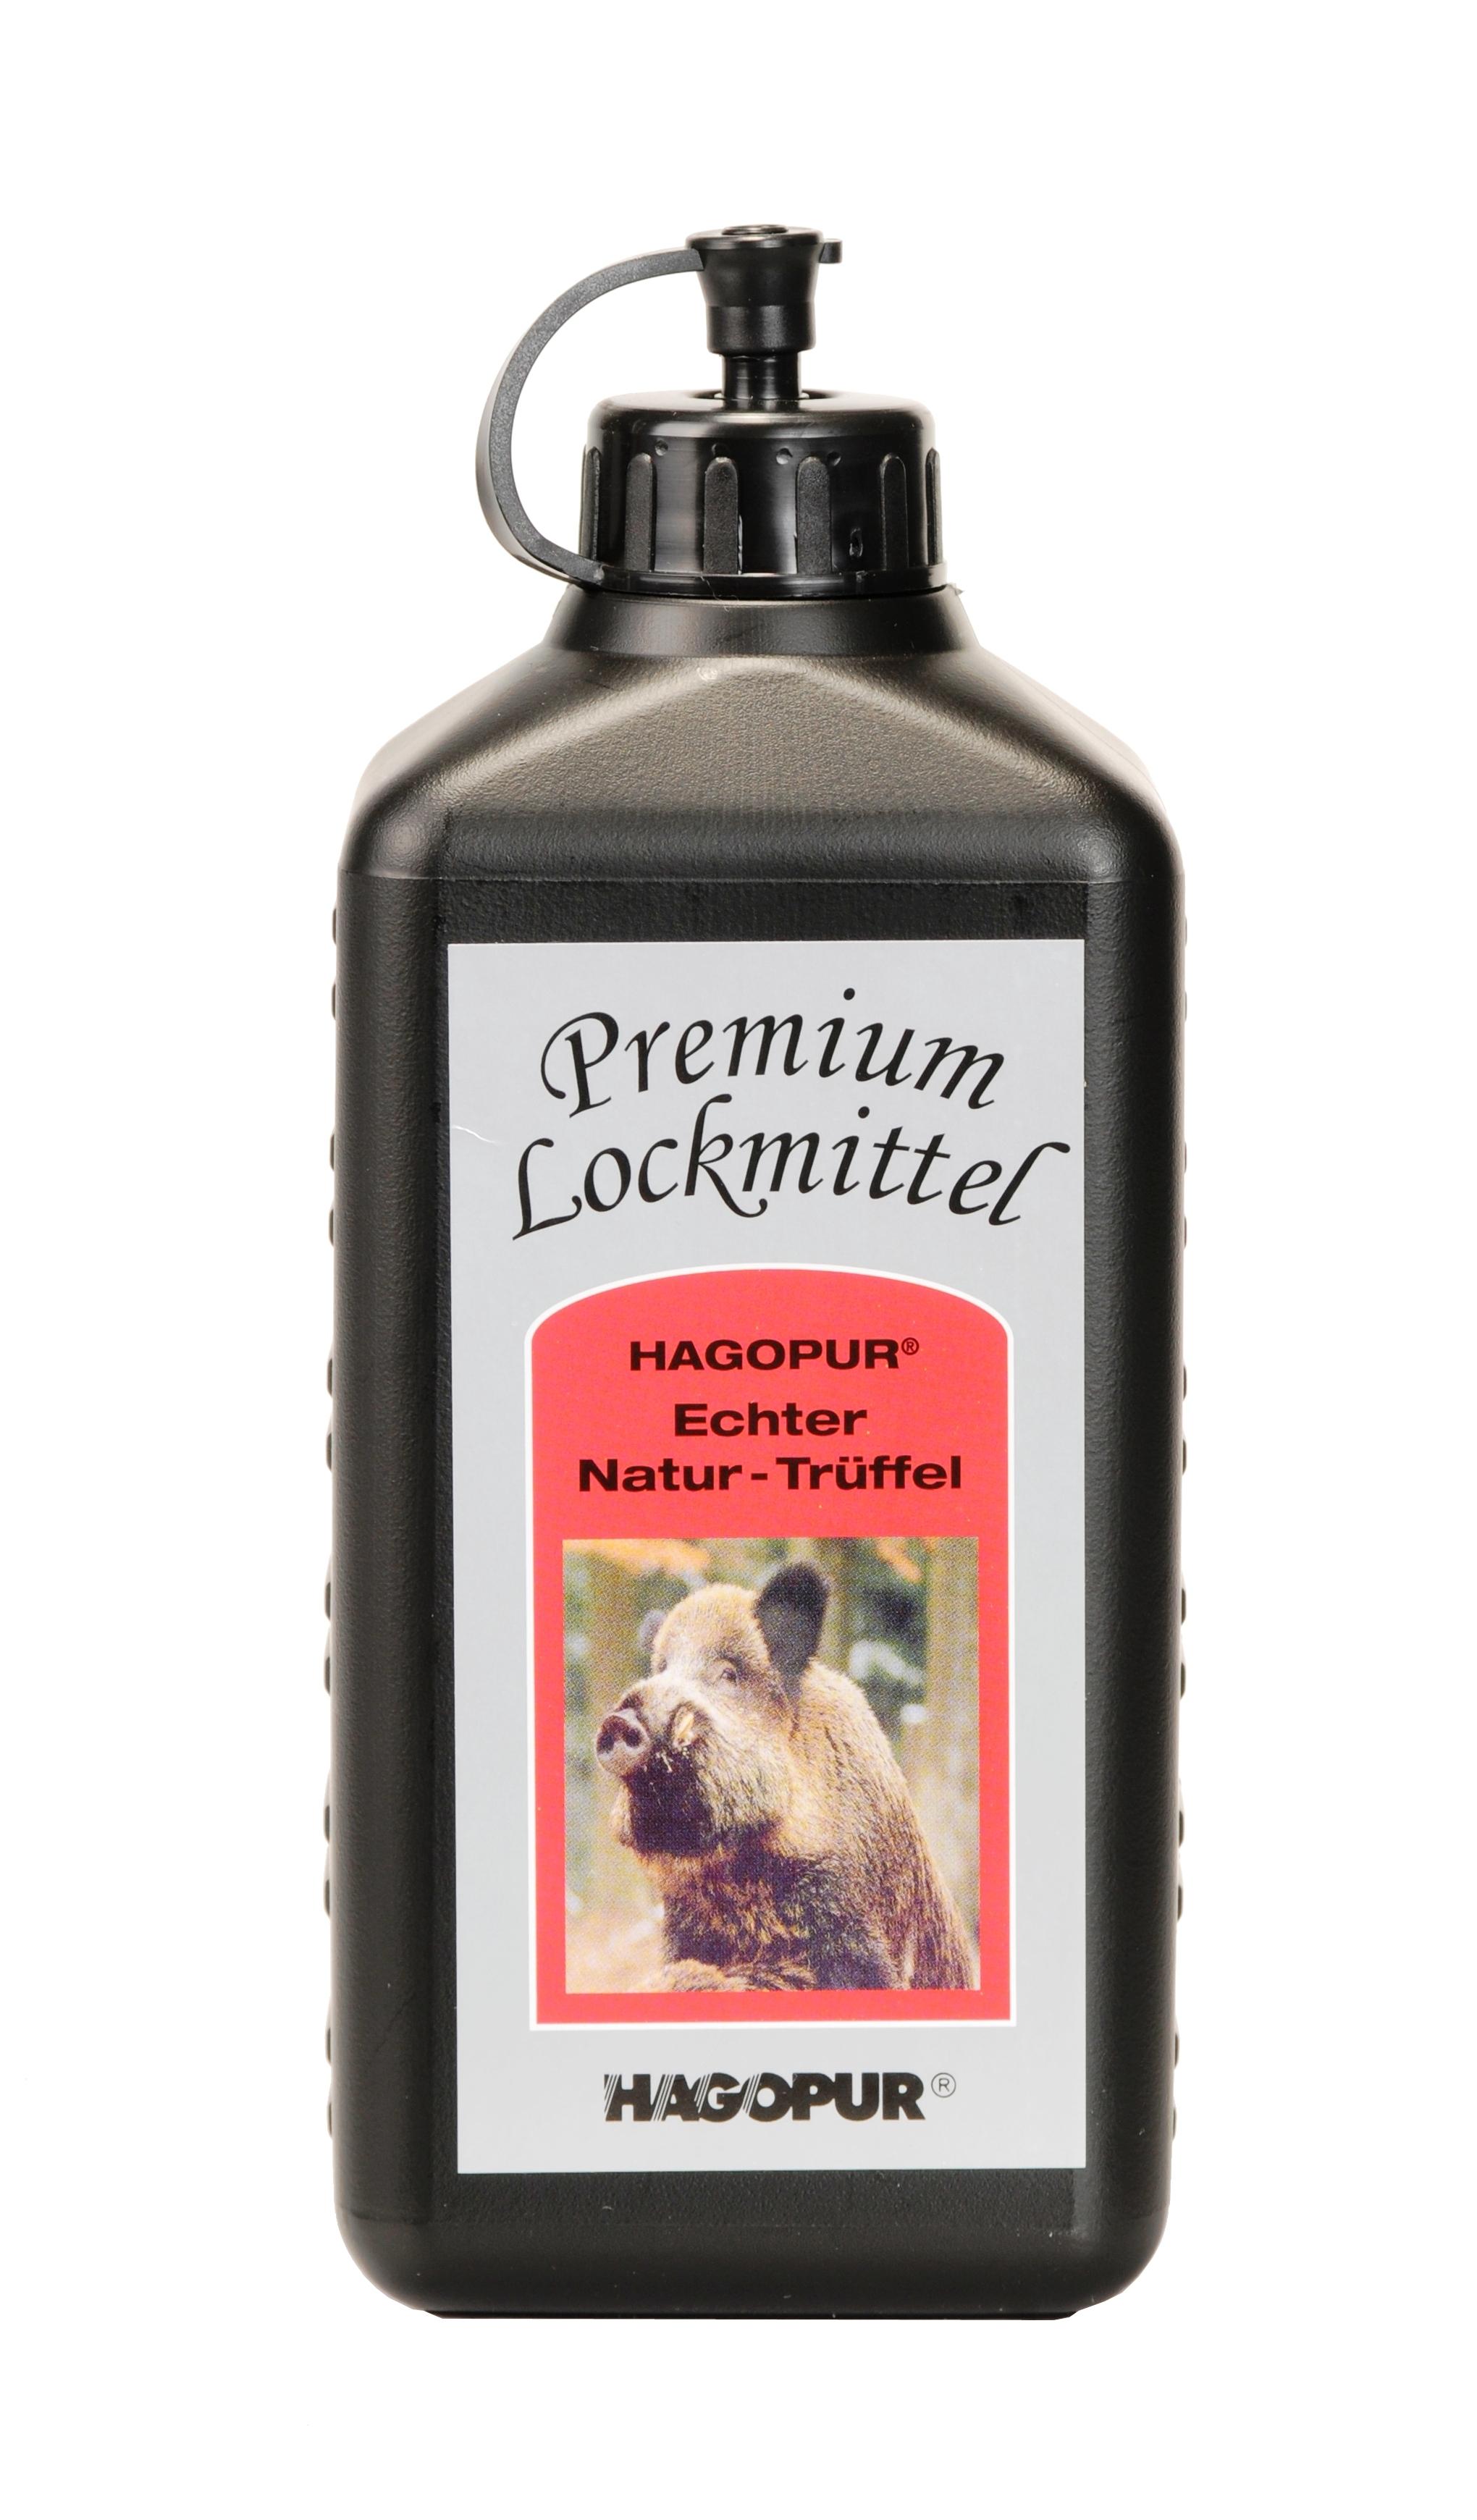 Hagopur Premium Lockmittel Echter Natur Trüffel